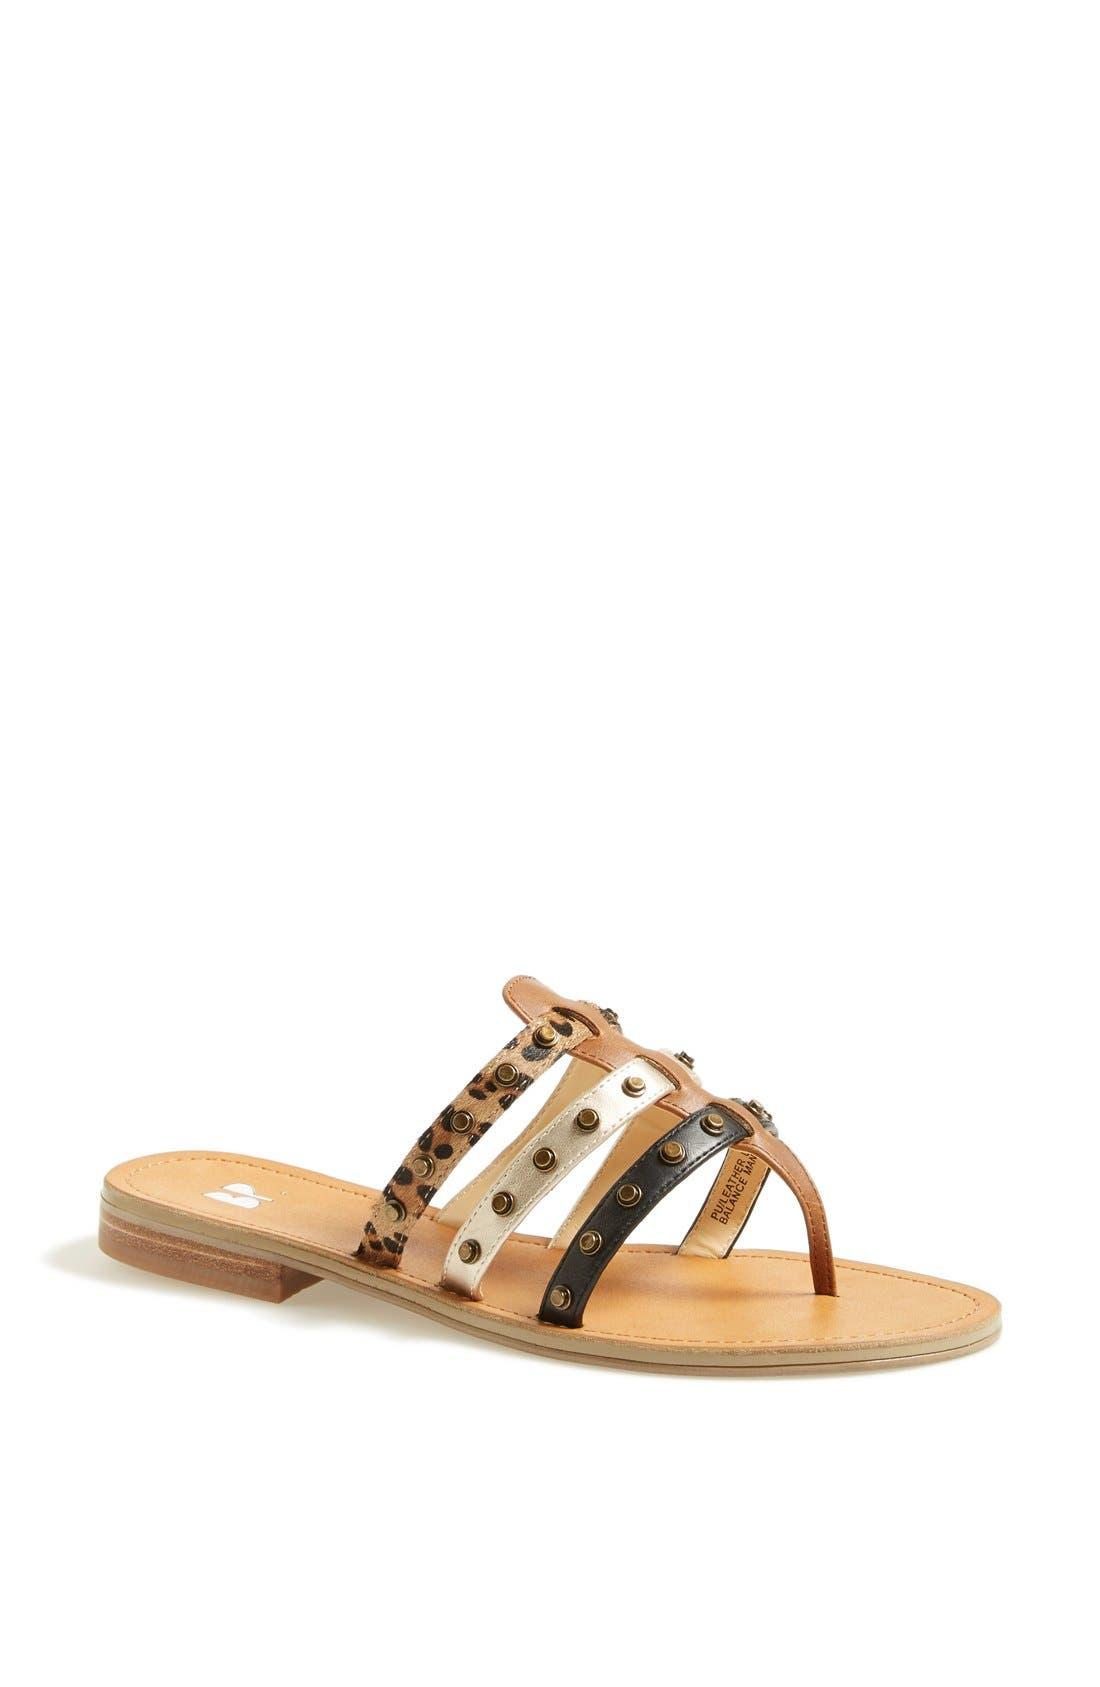 Alternate Image 1 Selected - BP. 'Kastoria' Flat Sandal